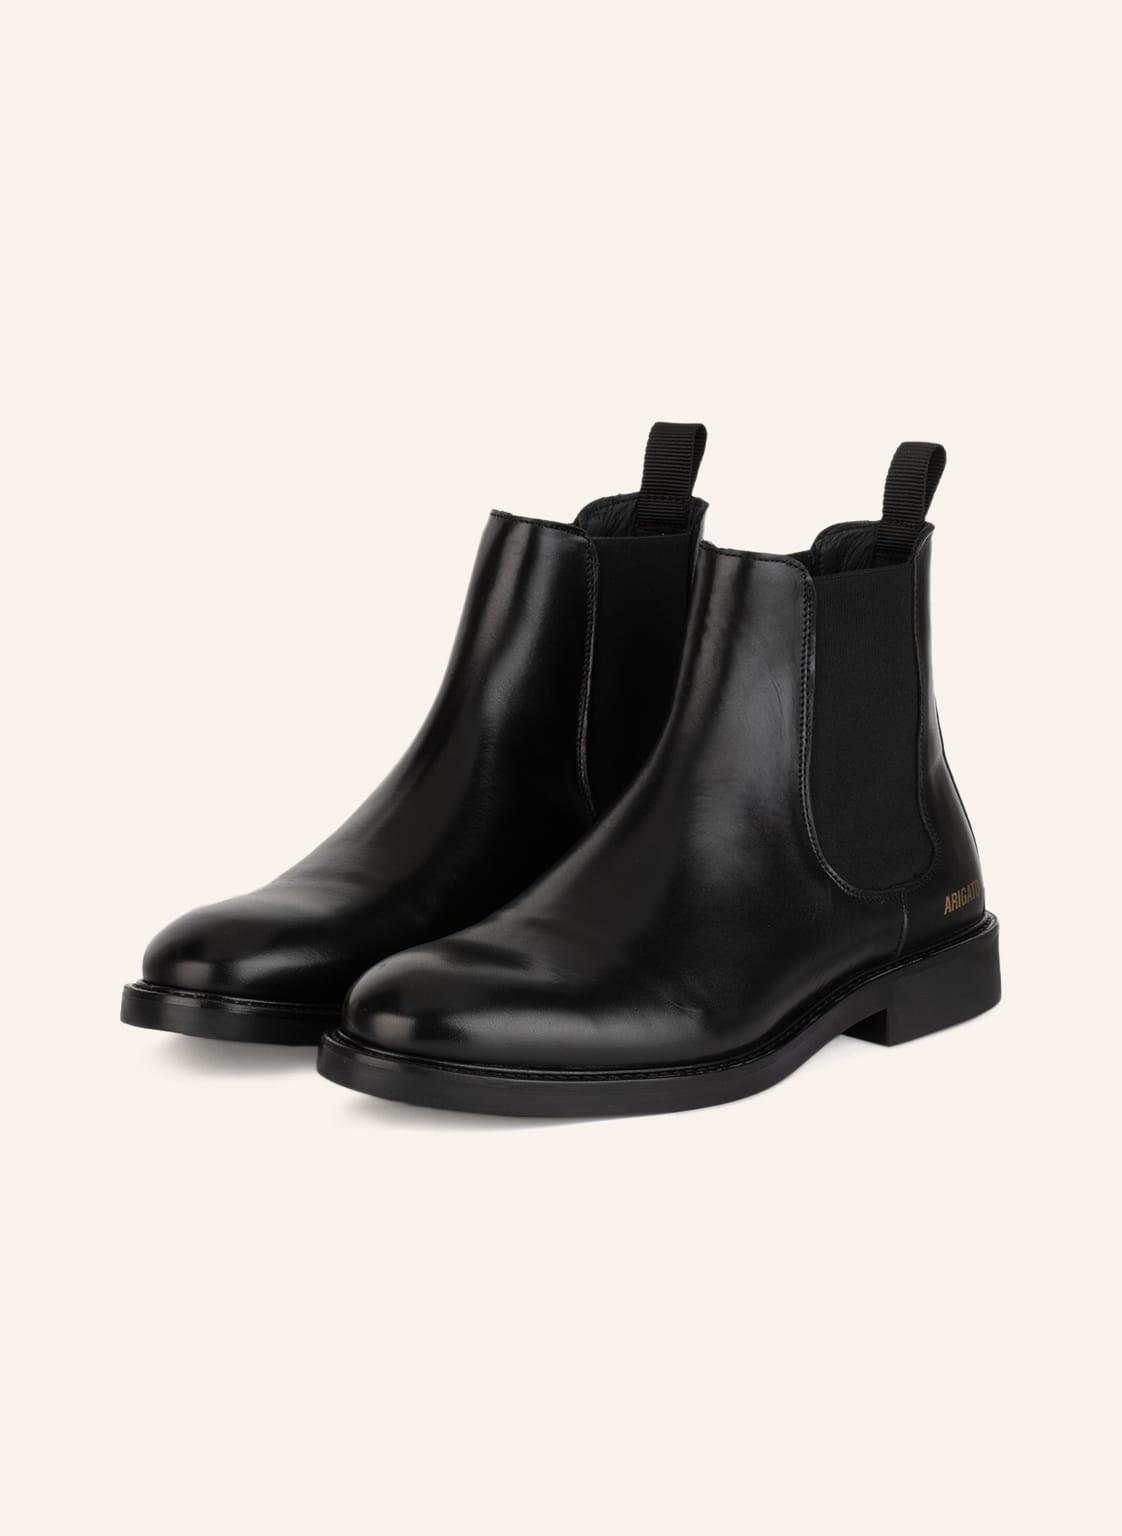 Image of Axel Arigato Chelsea-Boots schwarz